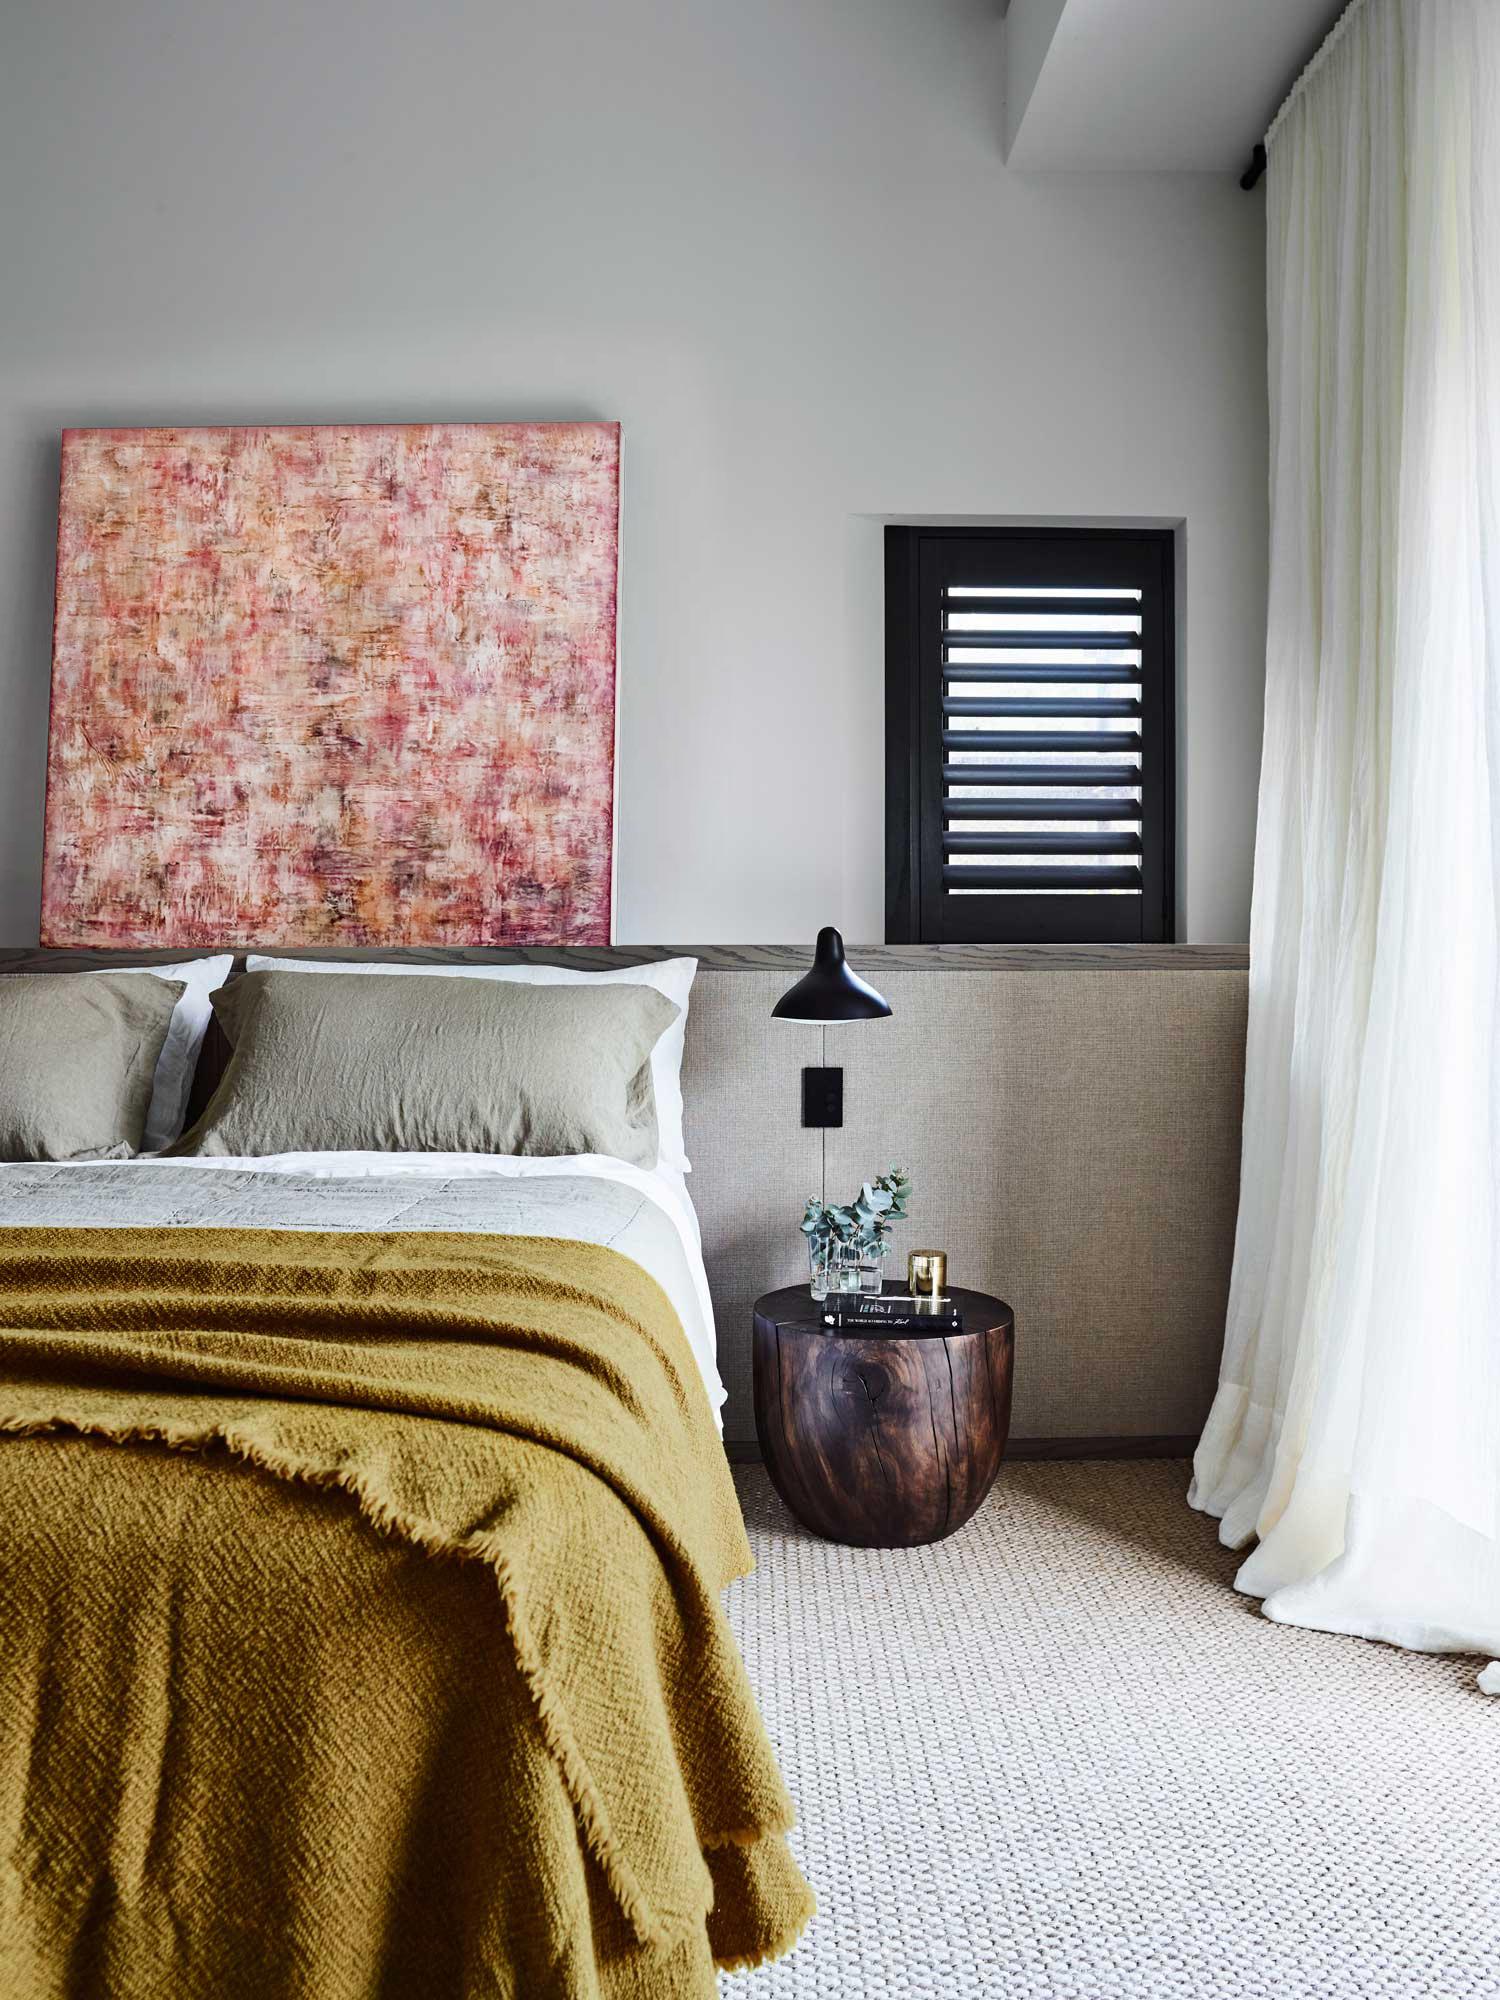 amanda moritz art bedroom interior design